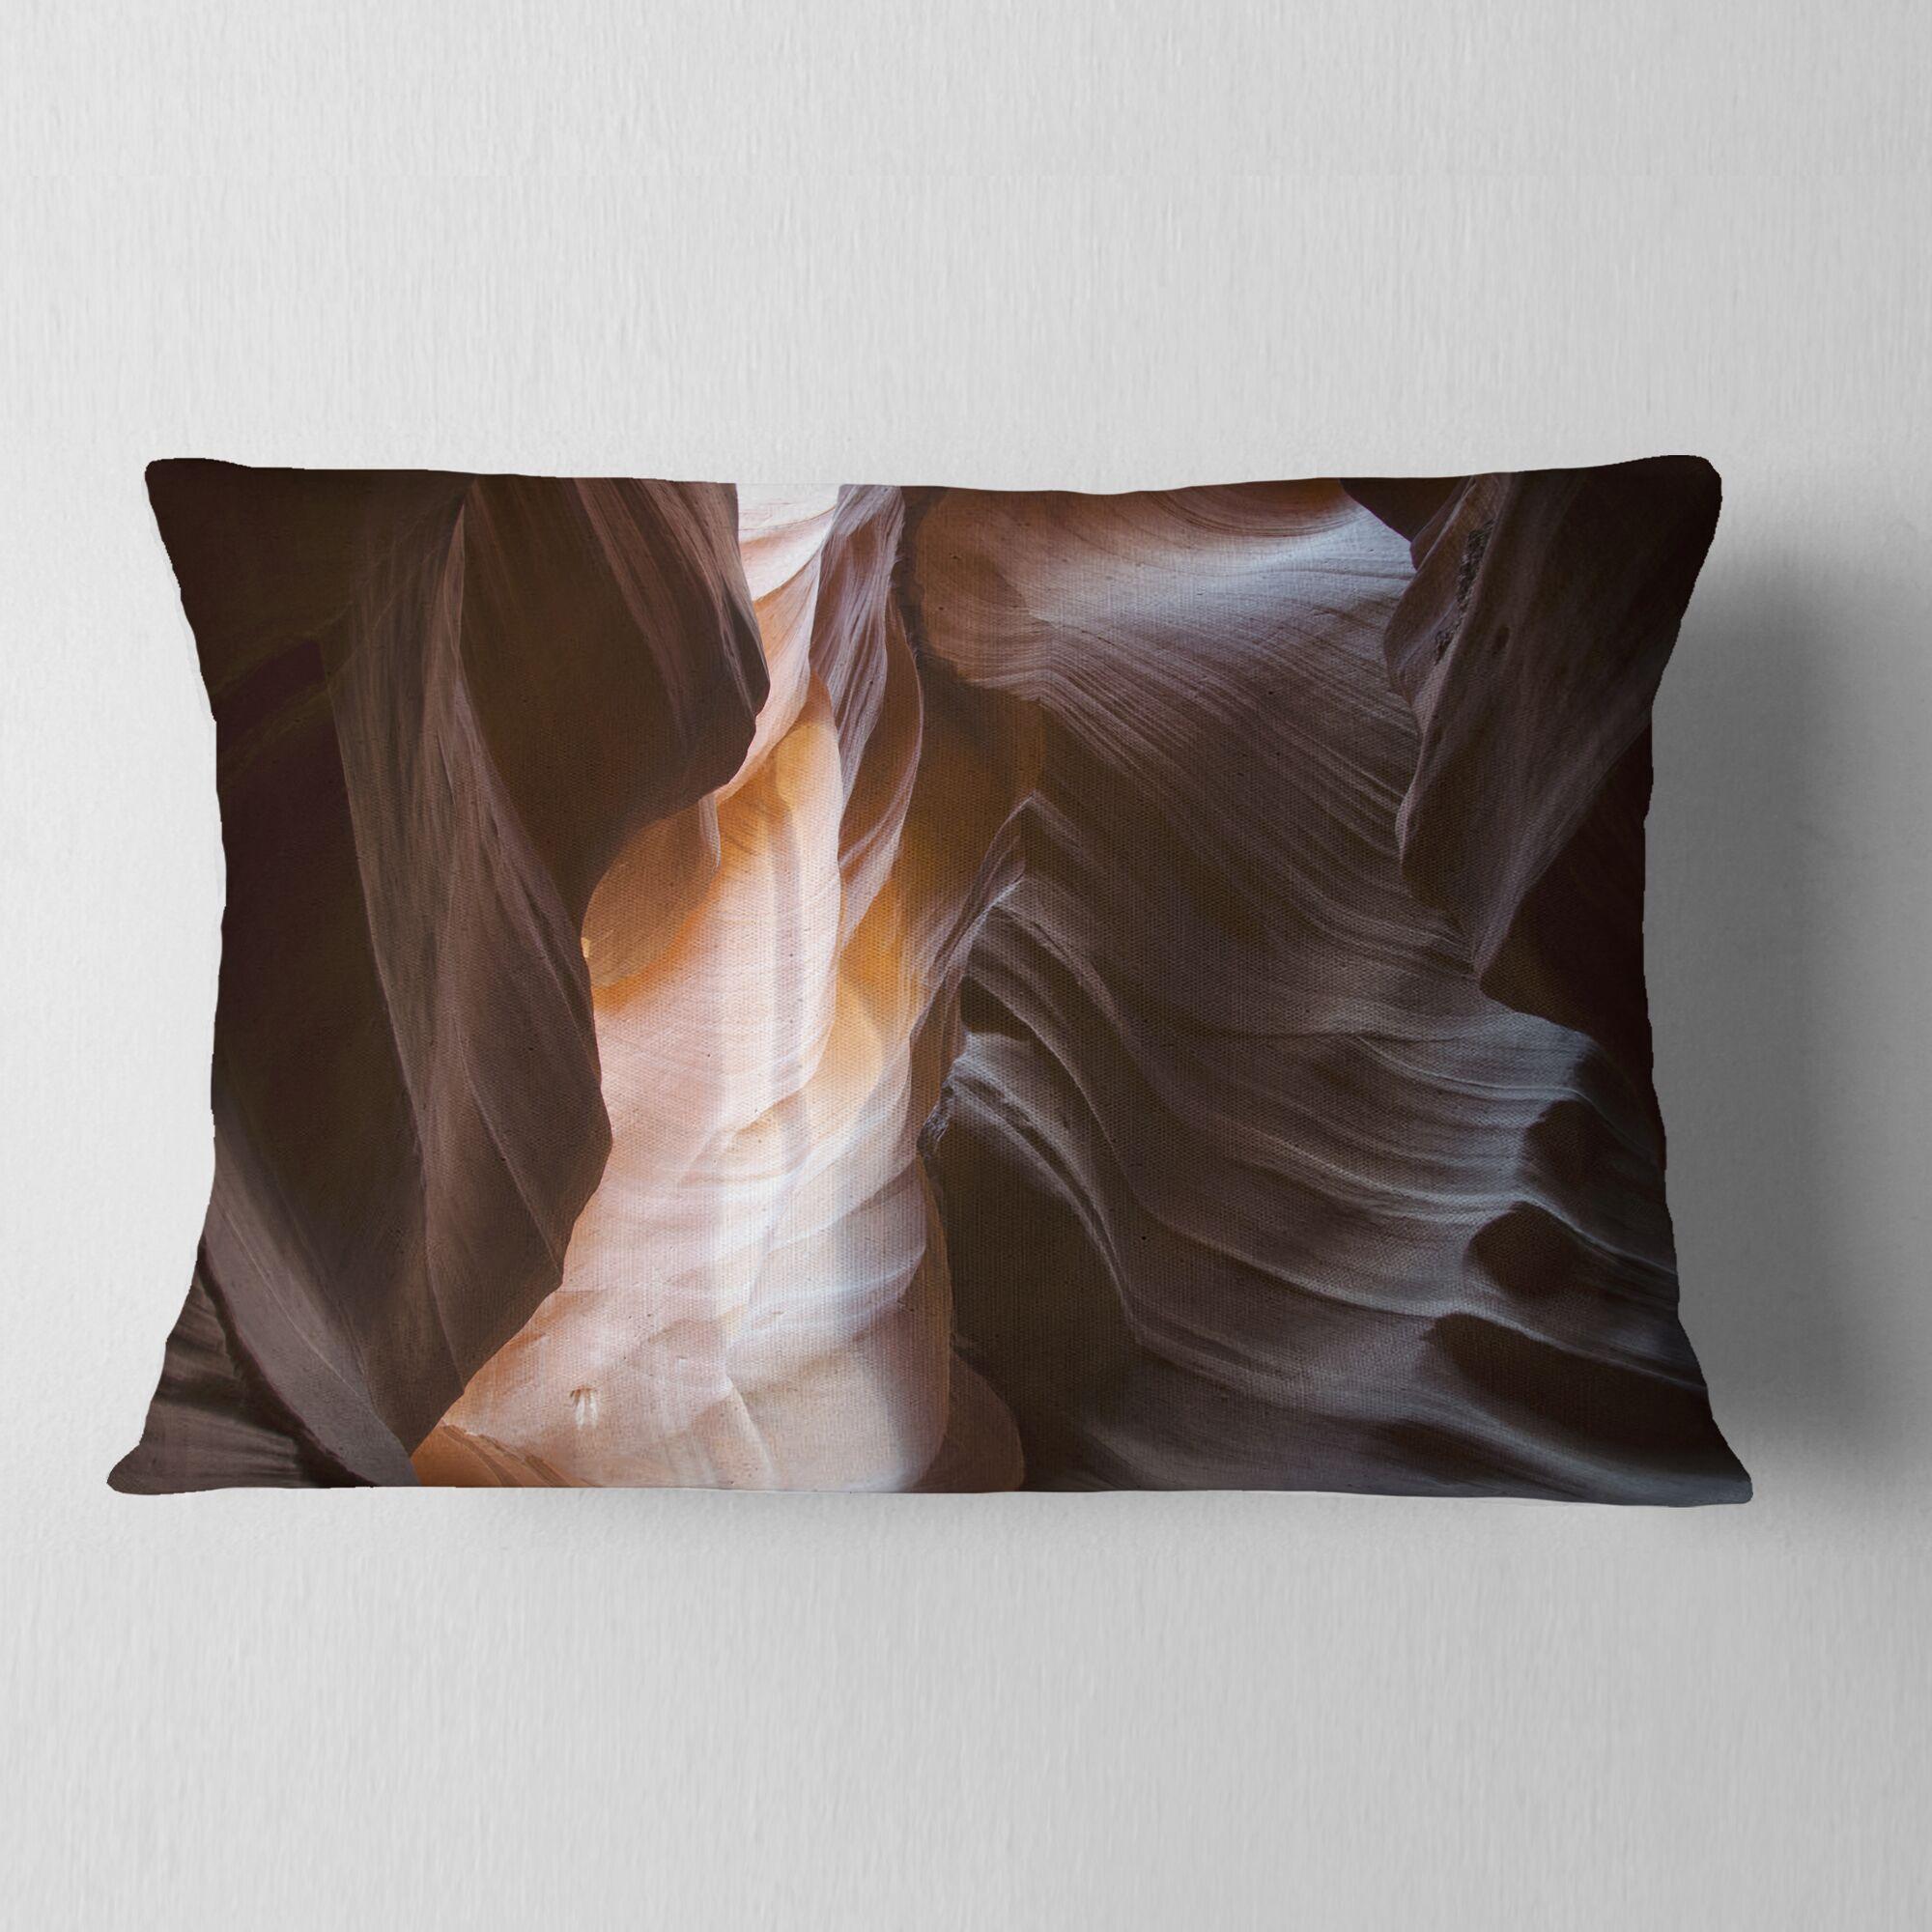 Designart 'Brown Antelope Canyon' Landscape Photography Throw Pillow